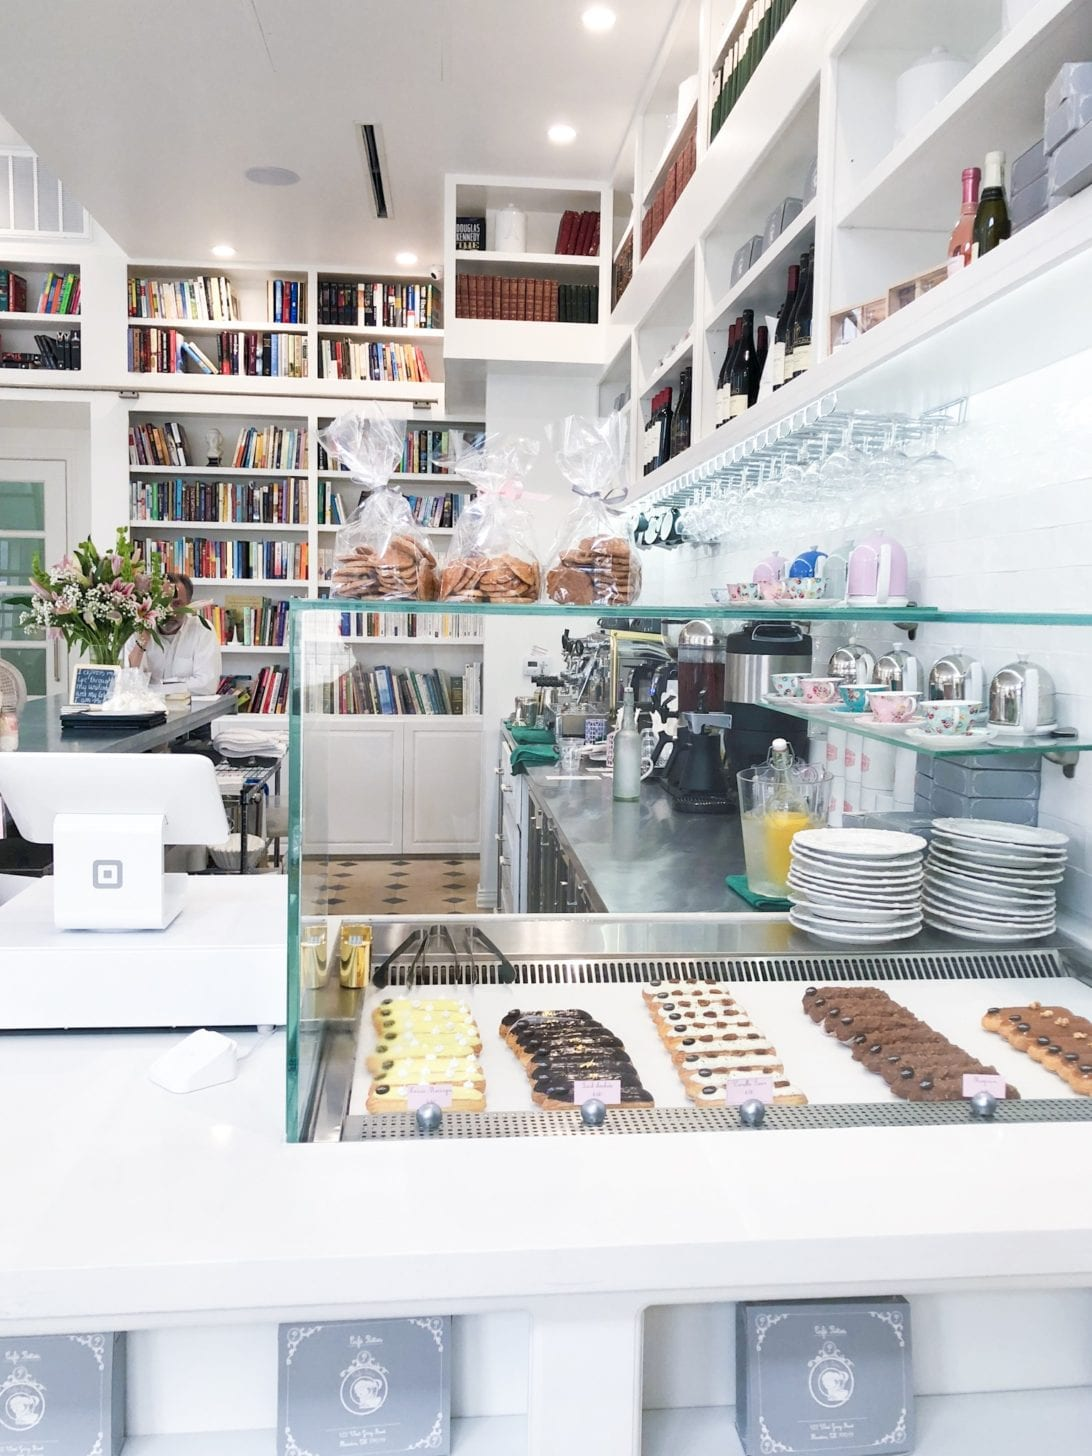 Cafe Poetes, cafes in Houston, Brunch spots in Houston, Houston restaurants, Instagram worthy restaurants, eclairs, French inspired cafes